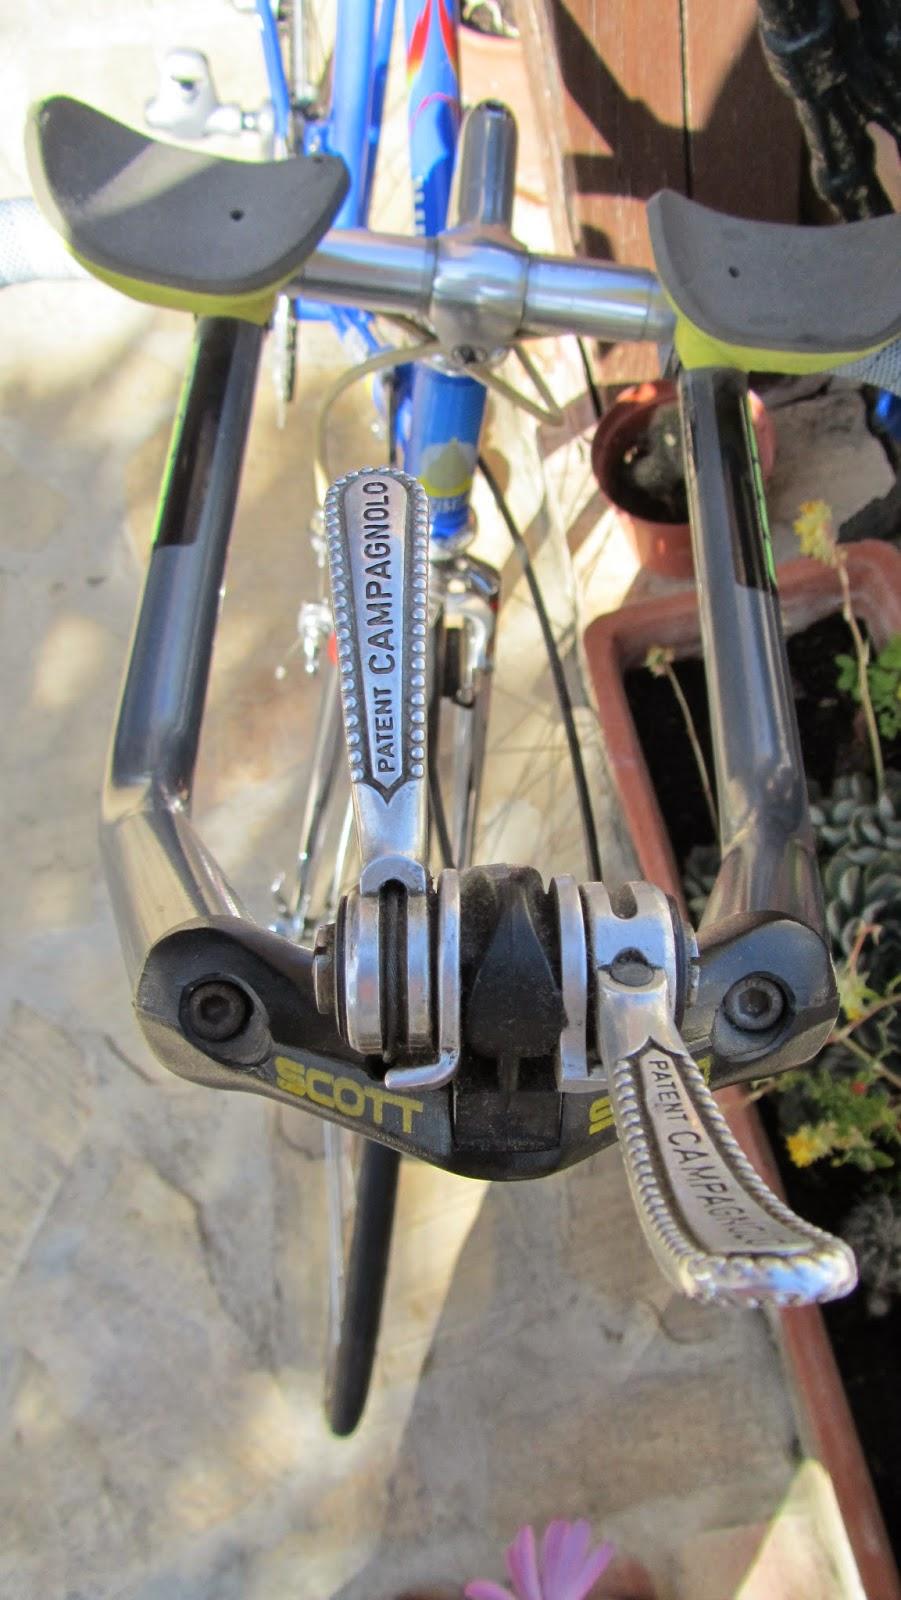 bicicleta orbea contrarreloj - palometas cambio campagnolo